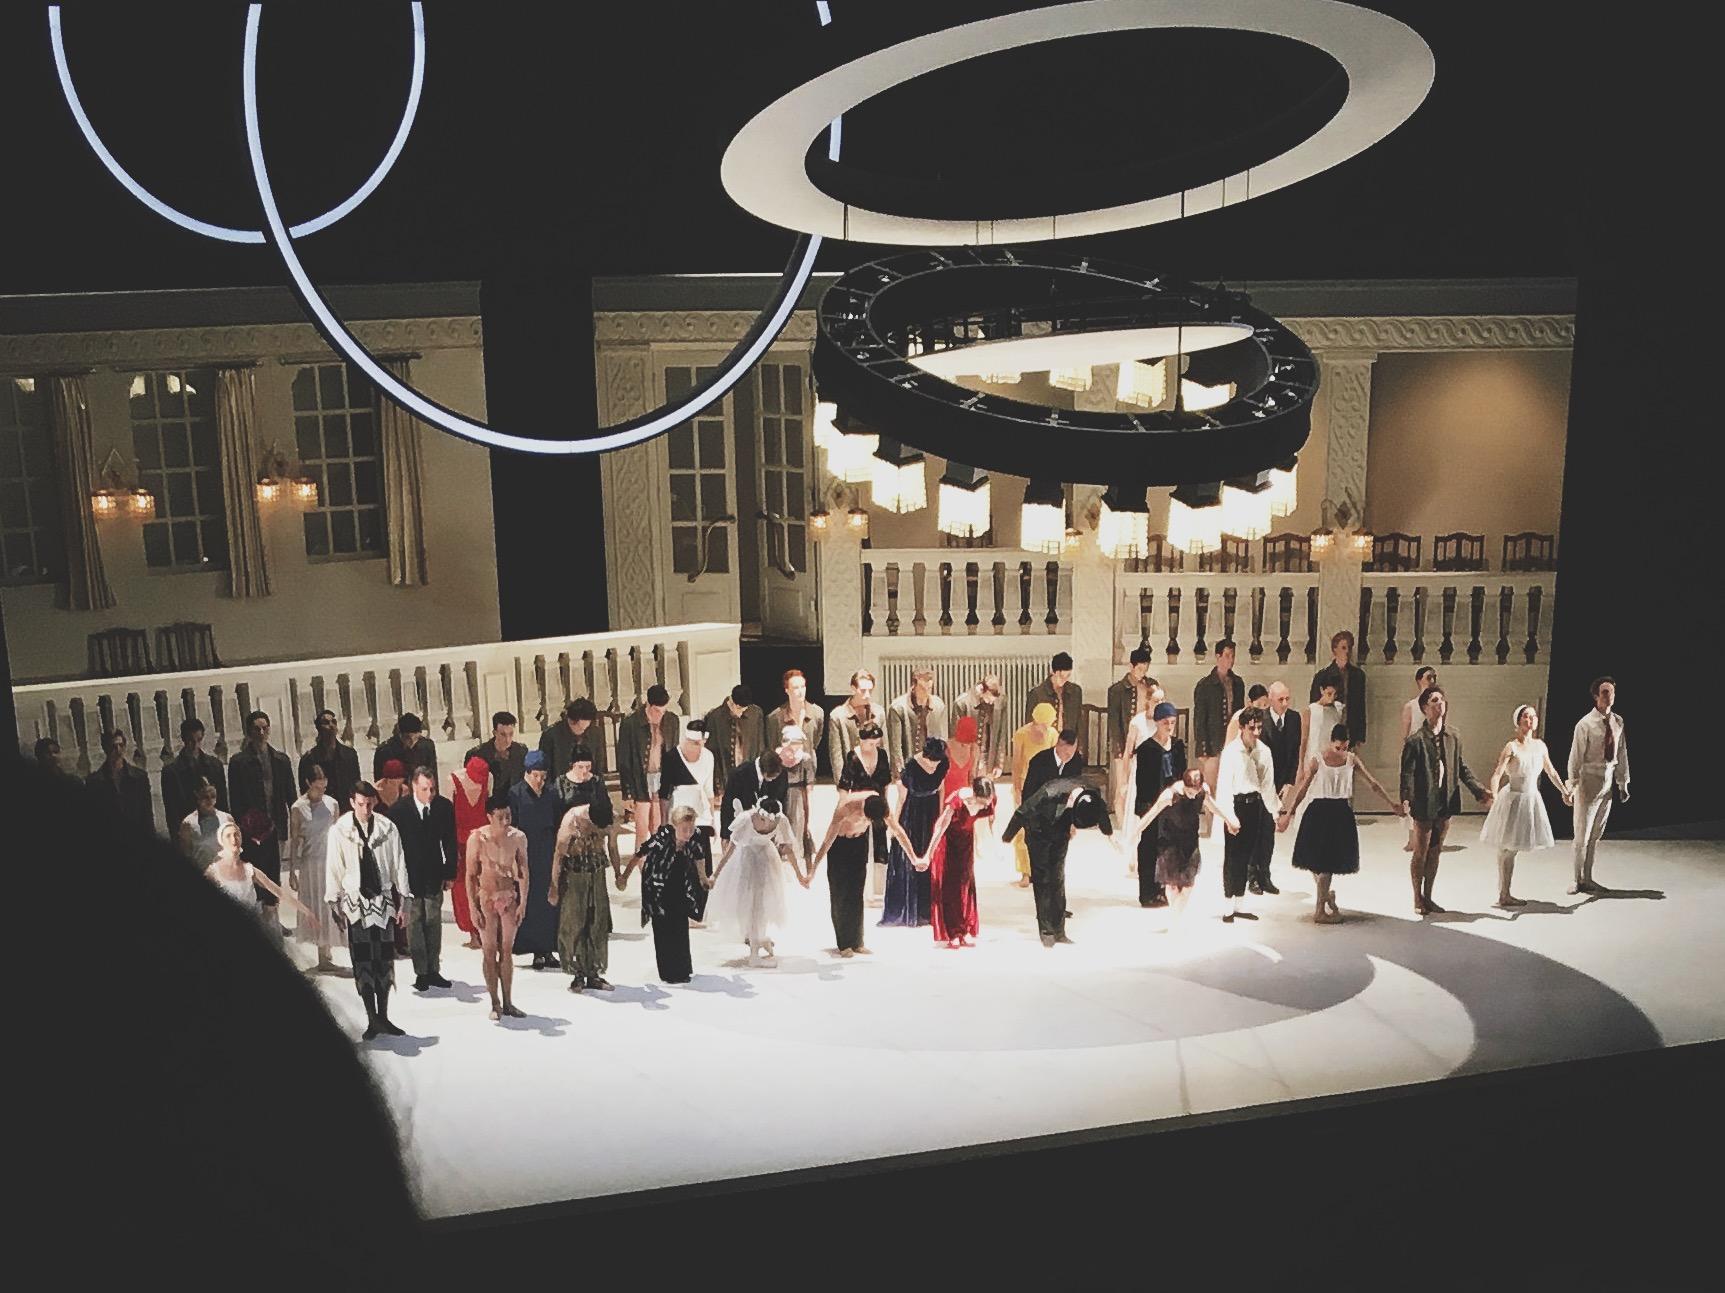 nijinsky / the australian ballet at arts centre melbourne